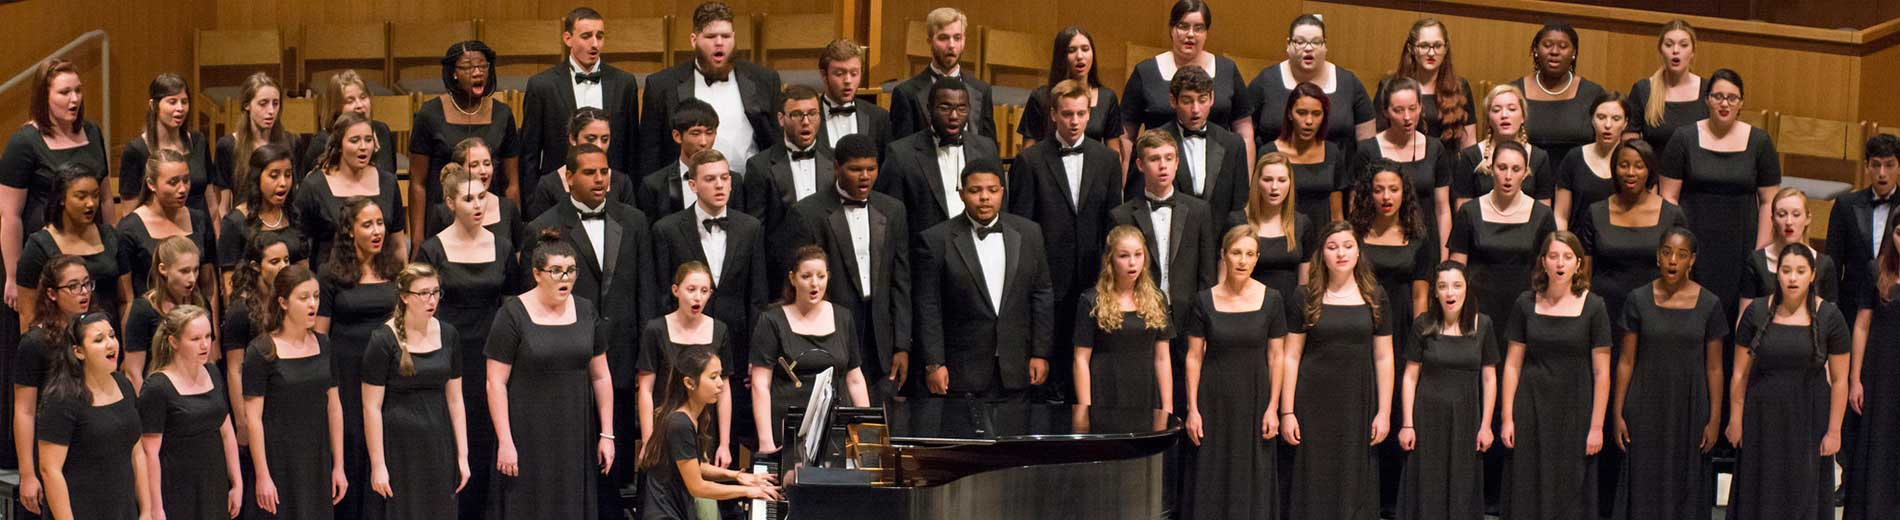 The Moorings Presbyterian Church Concert